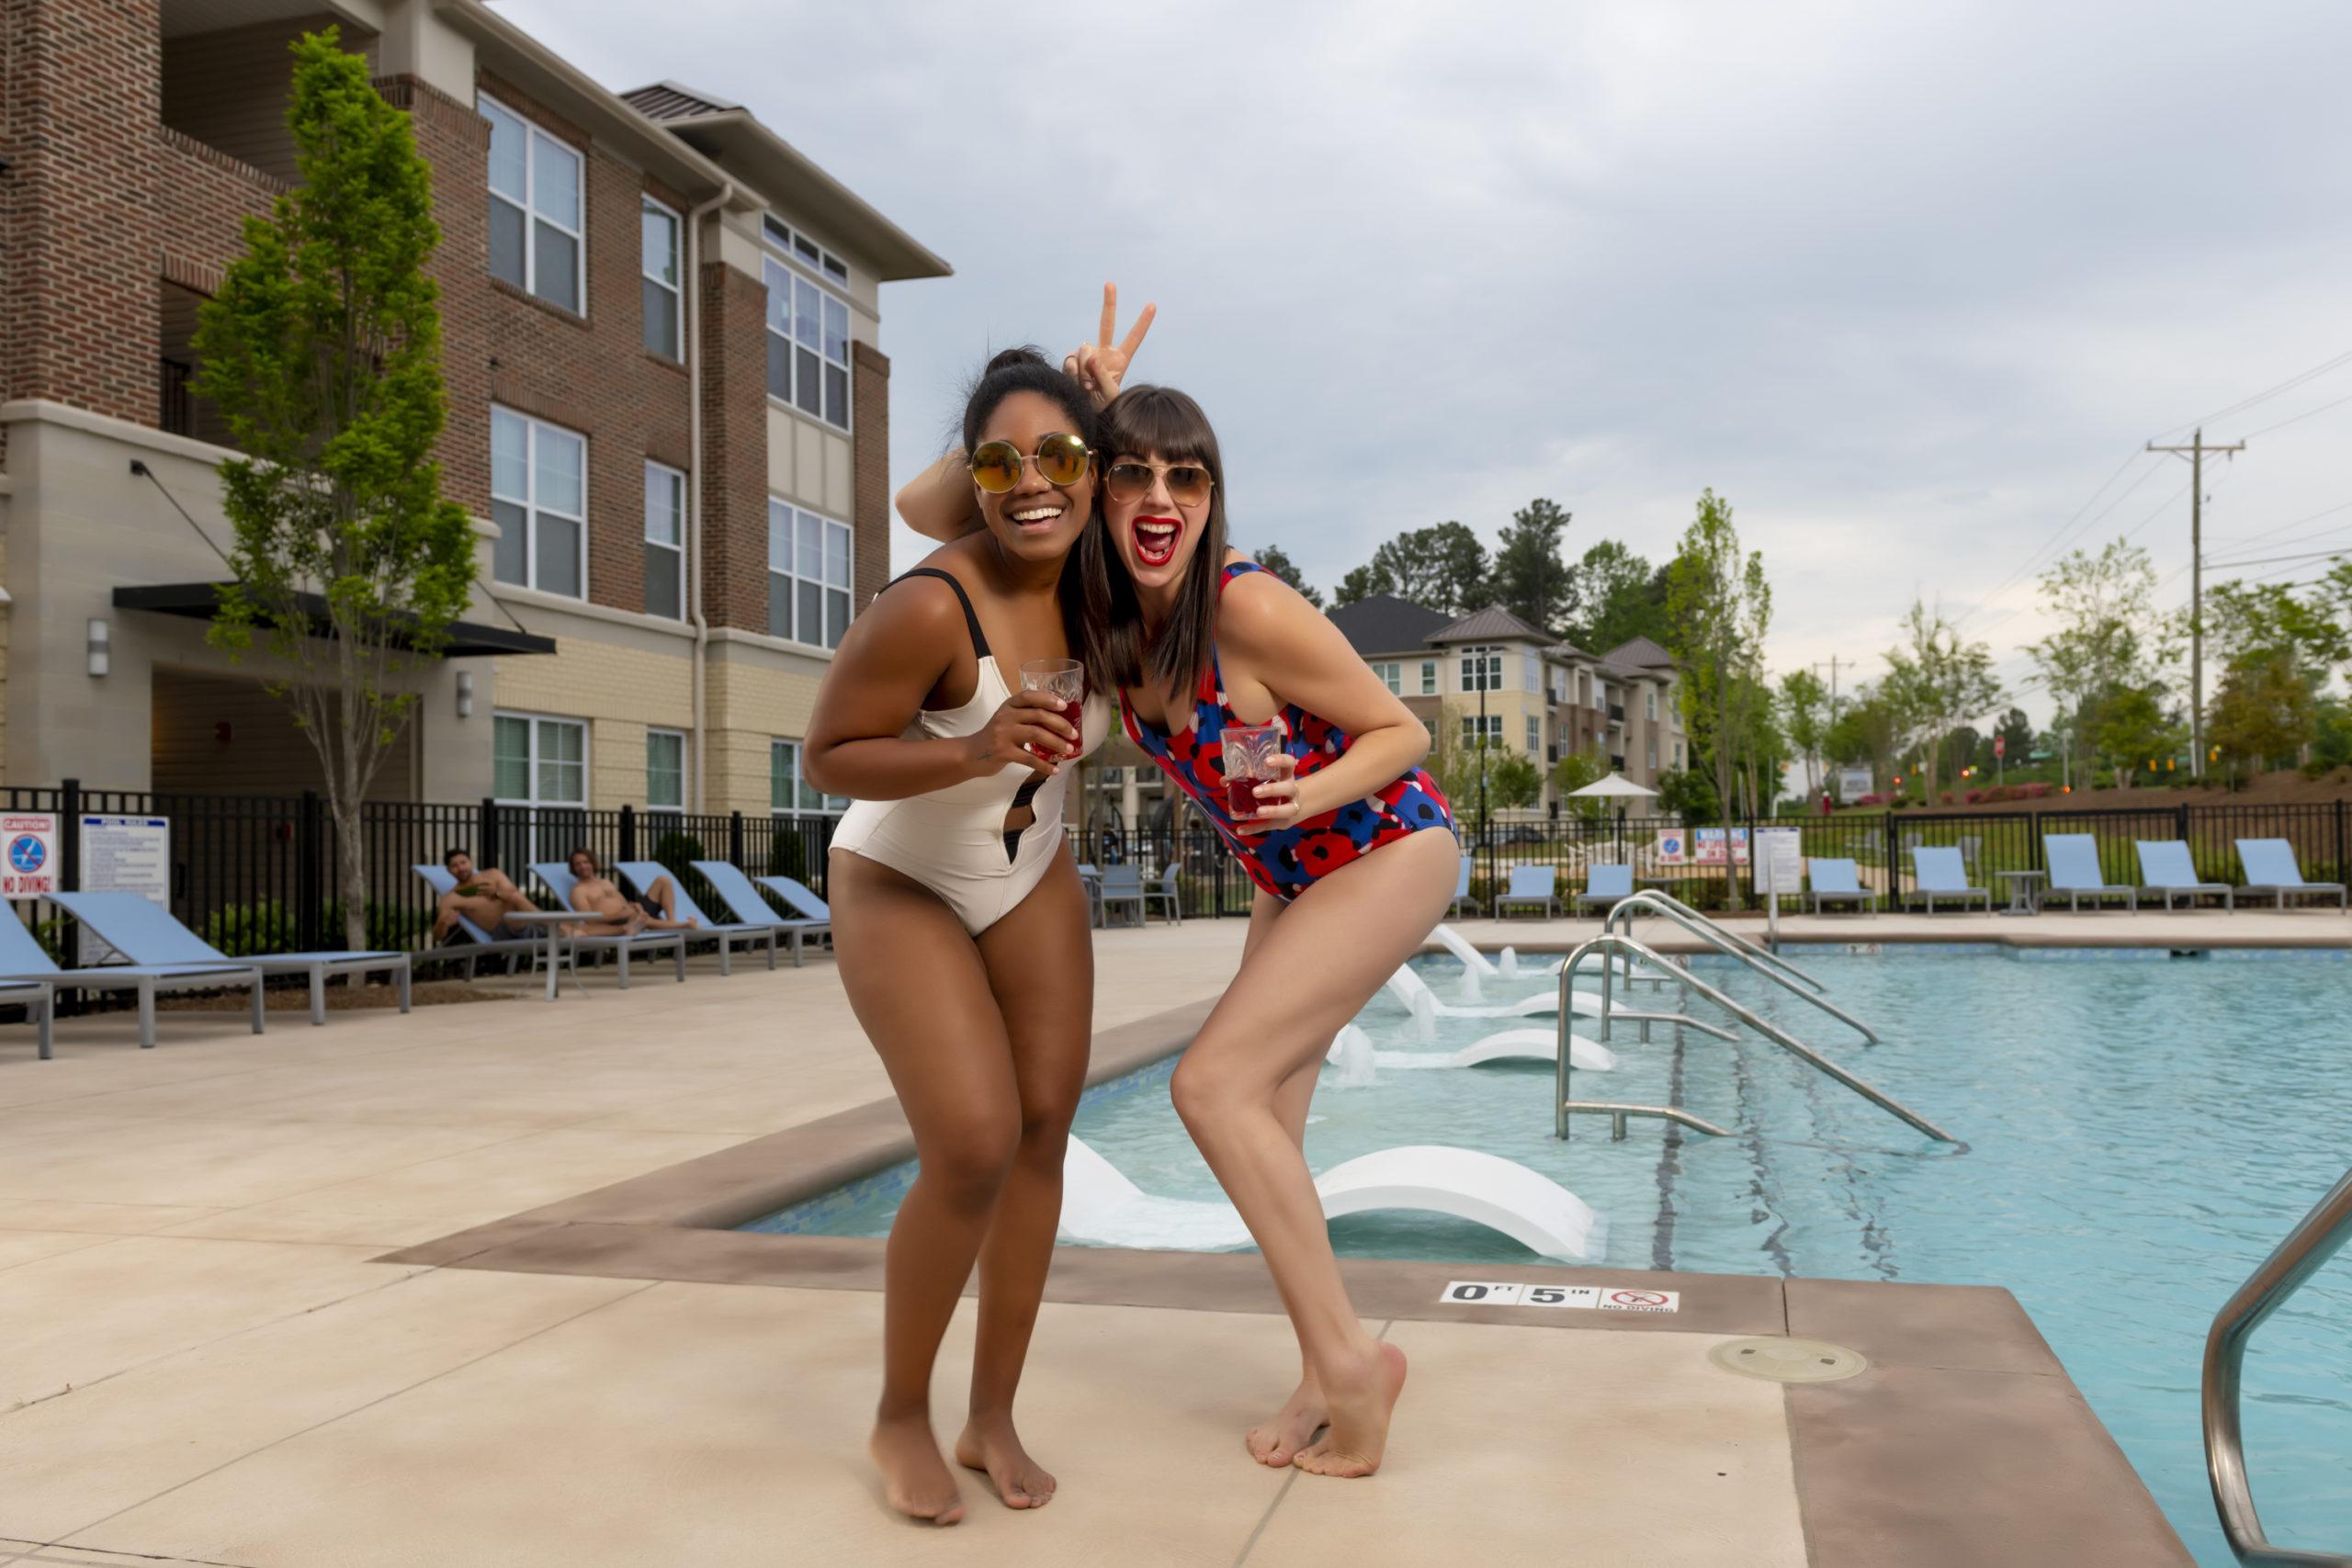 girl friends drinking summer recipe margaritas by pool